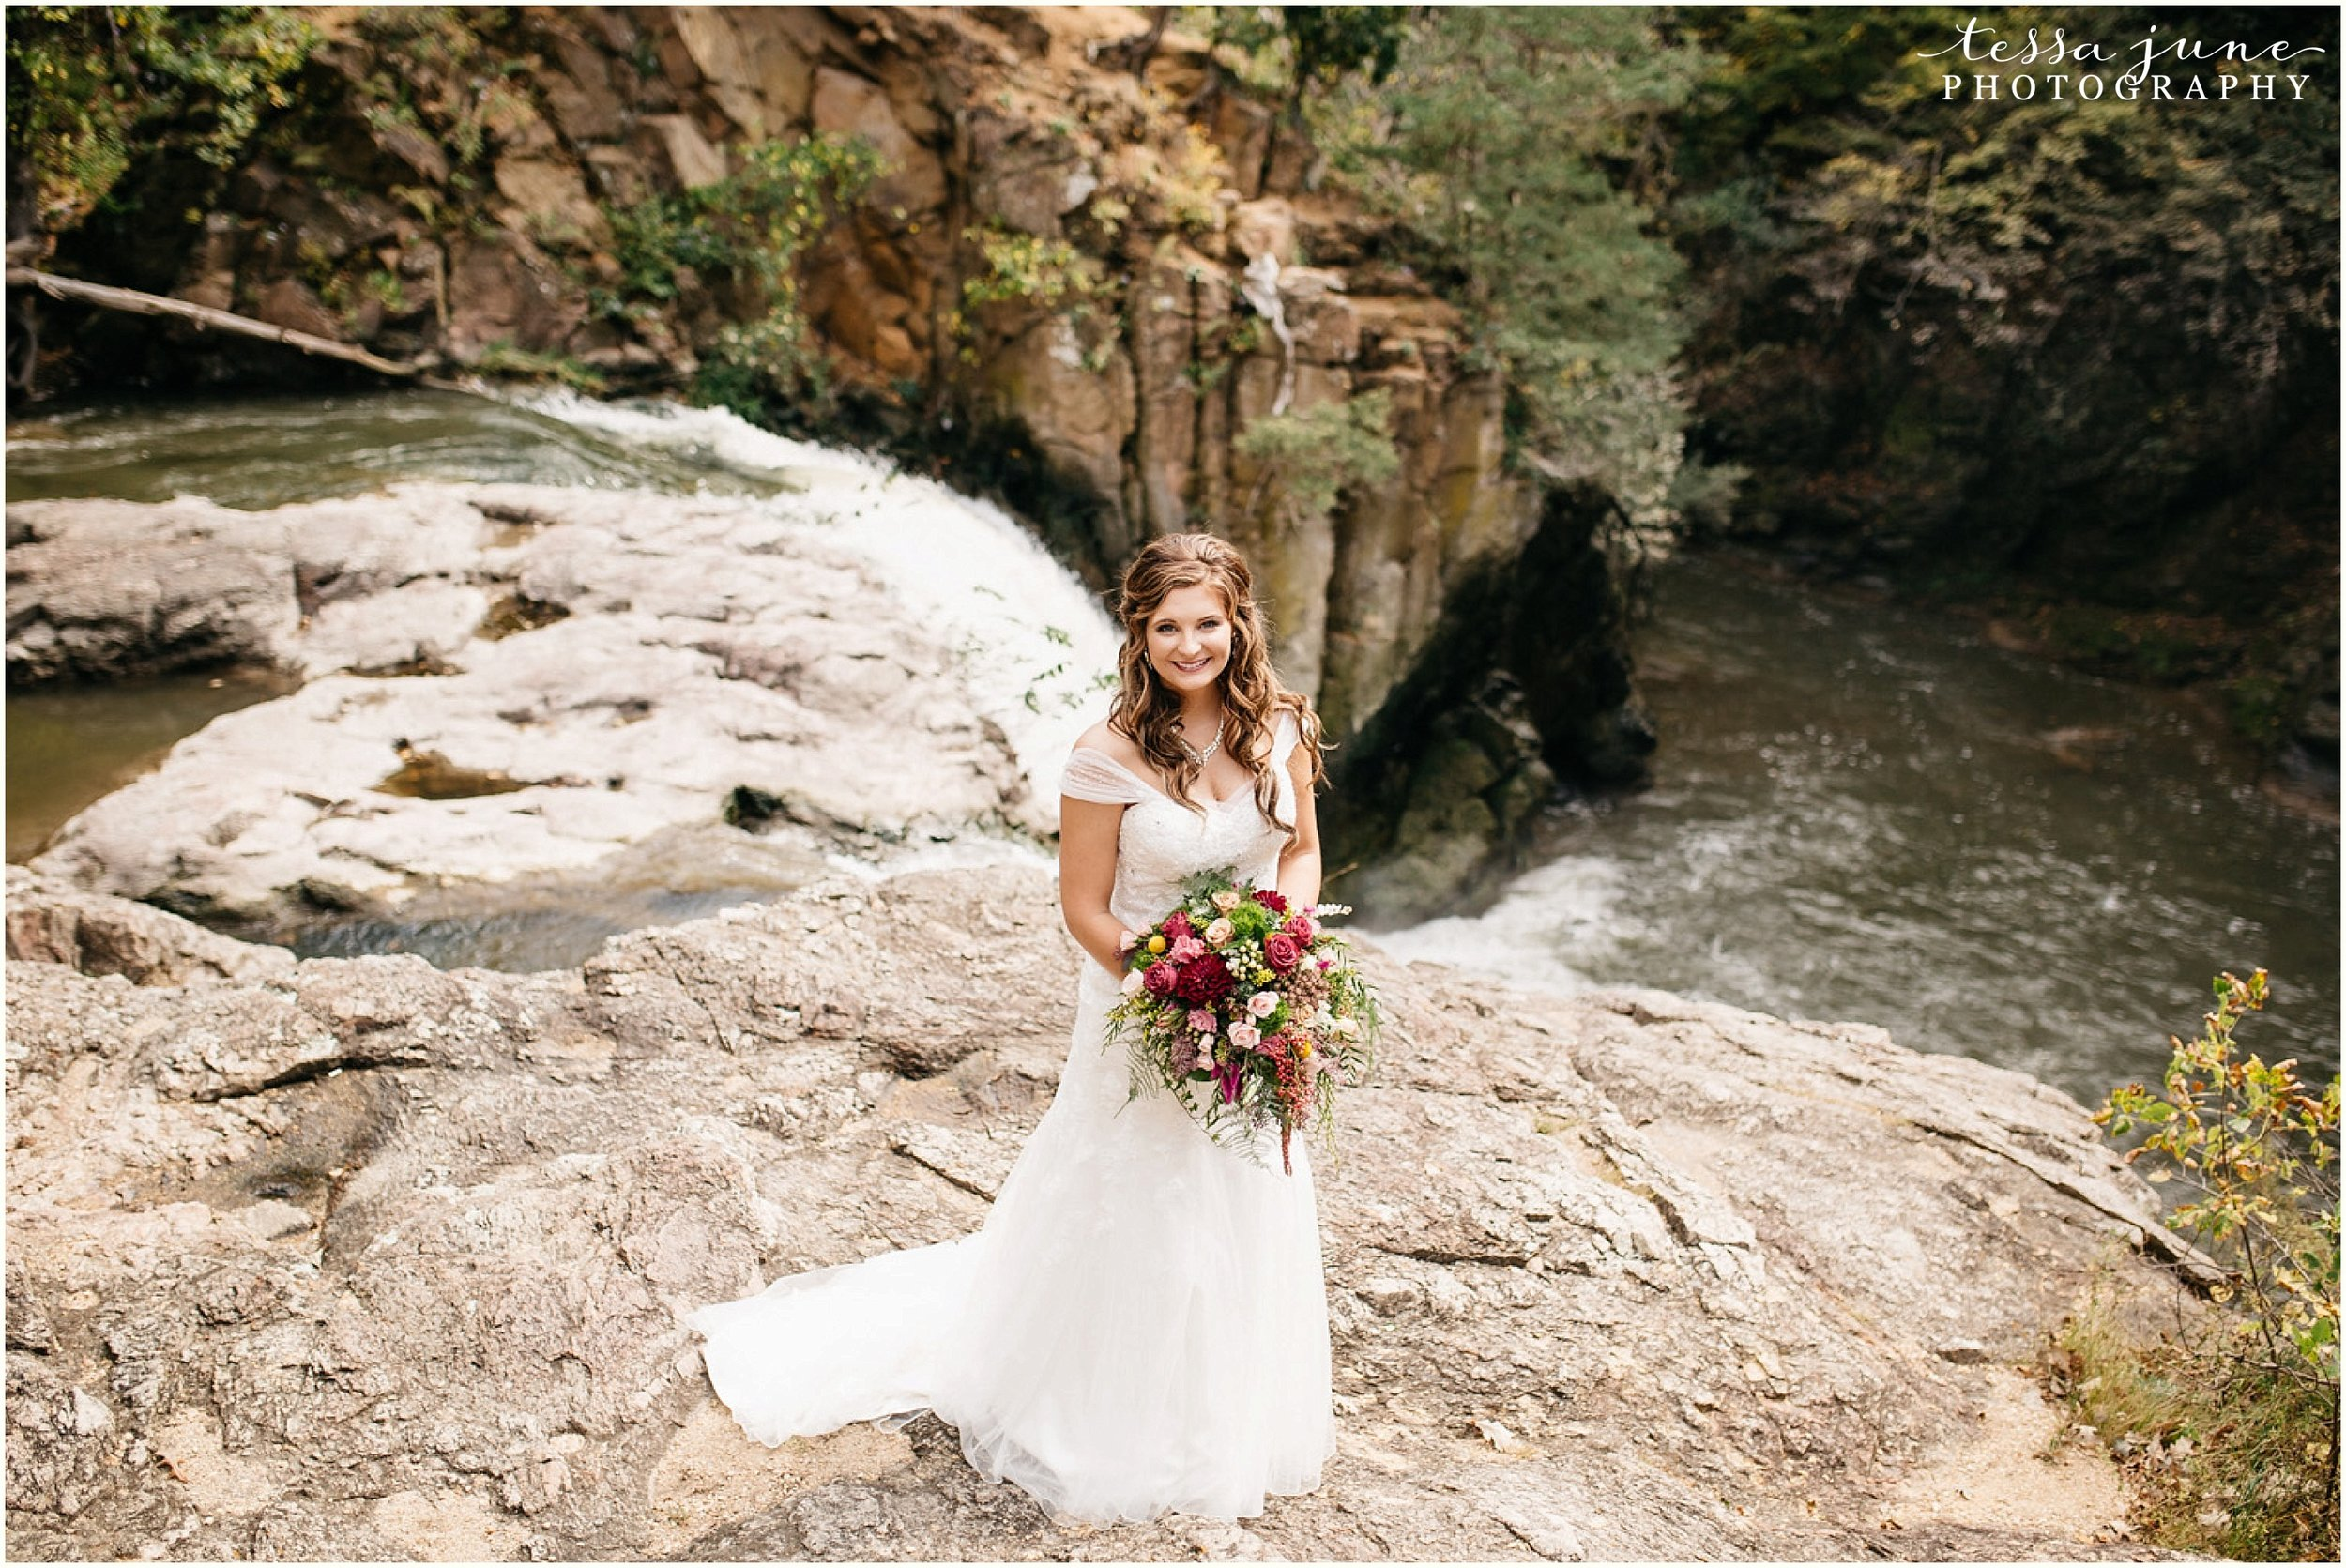 bohemian-minnesota-wedding-mismatched-bridesmaid-dresses-waterfall-st-cloud-tessa-june-photography-65.jpg